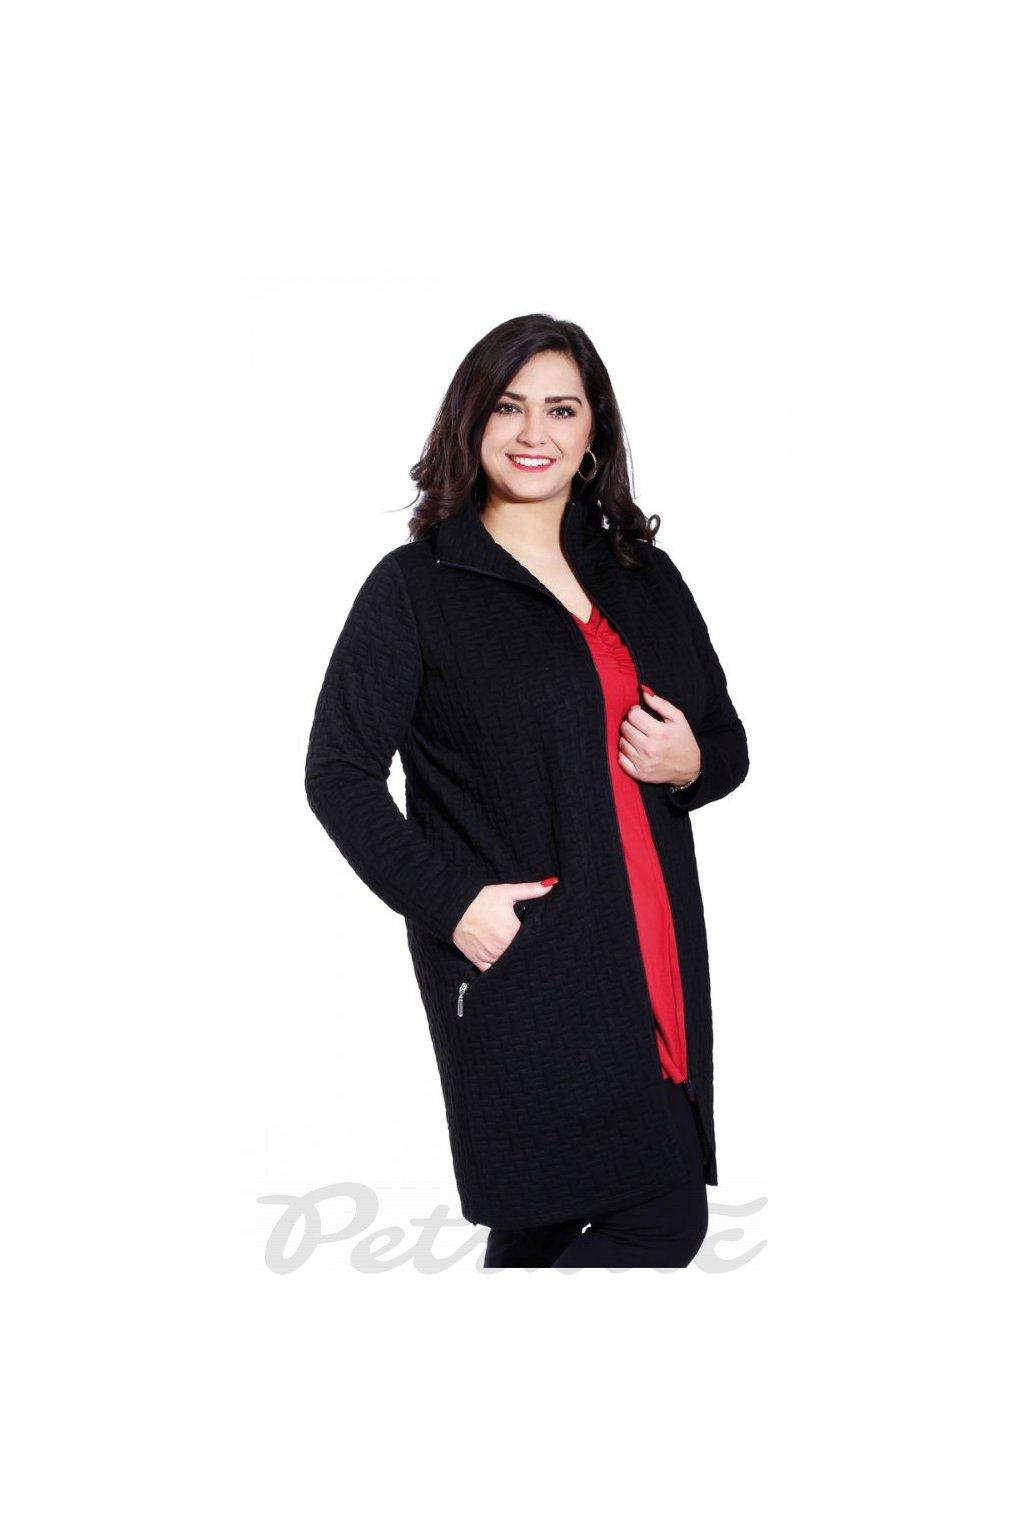 SILVIE S - kabátek 80 - 85 cm